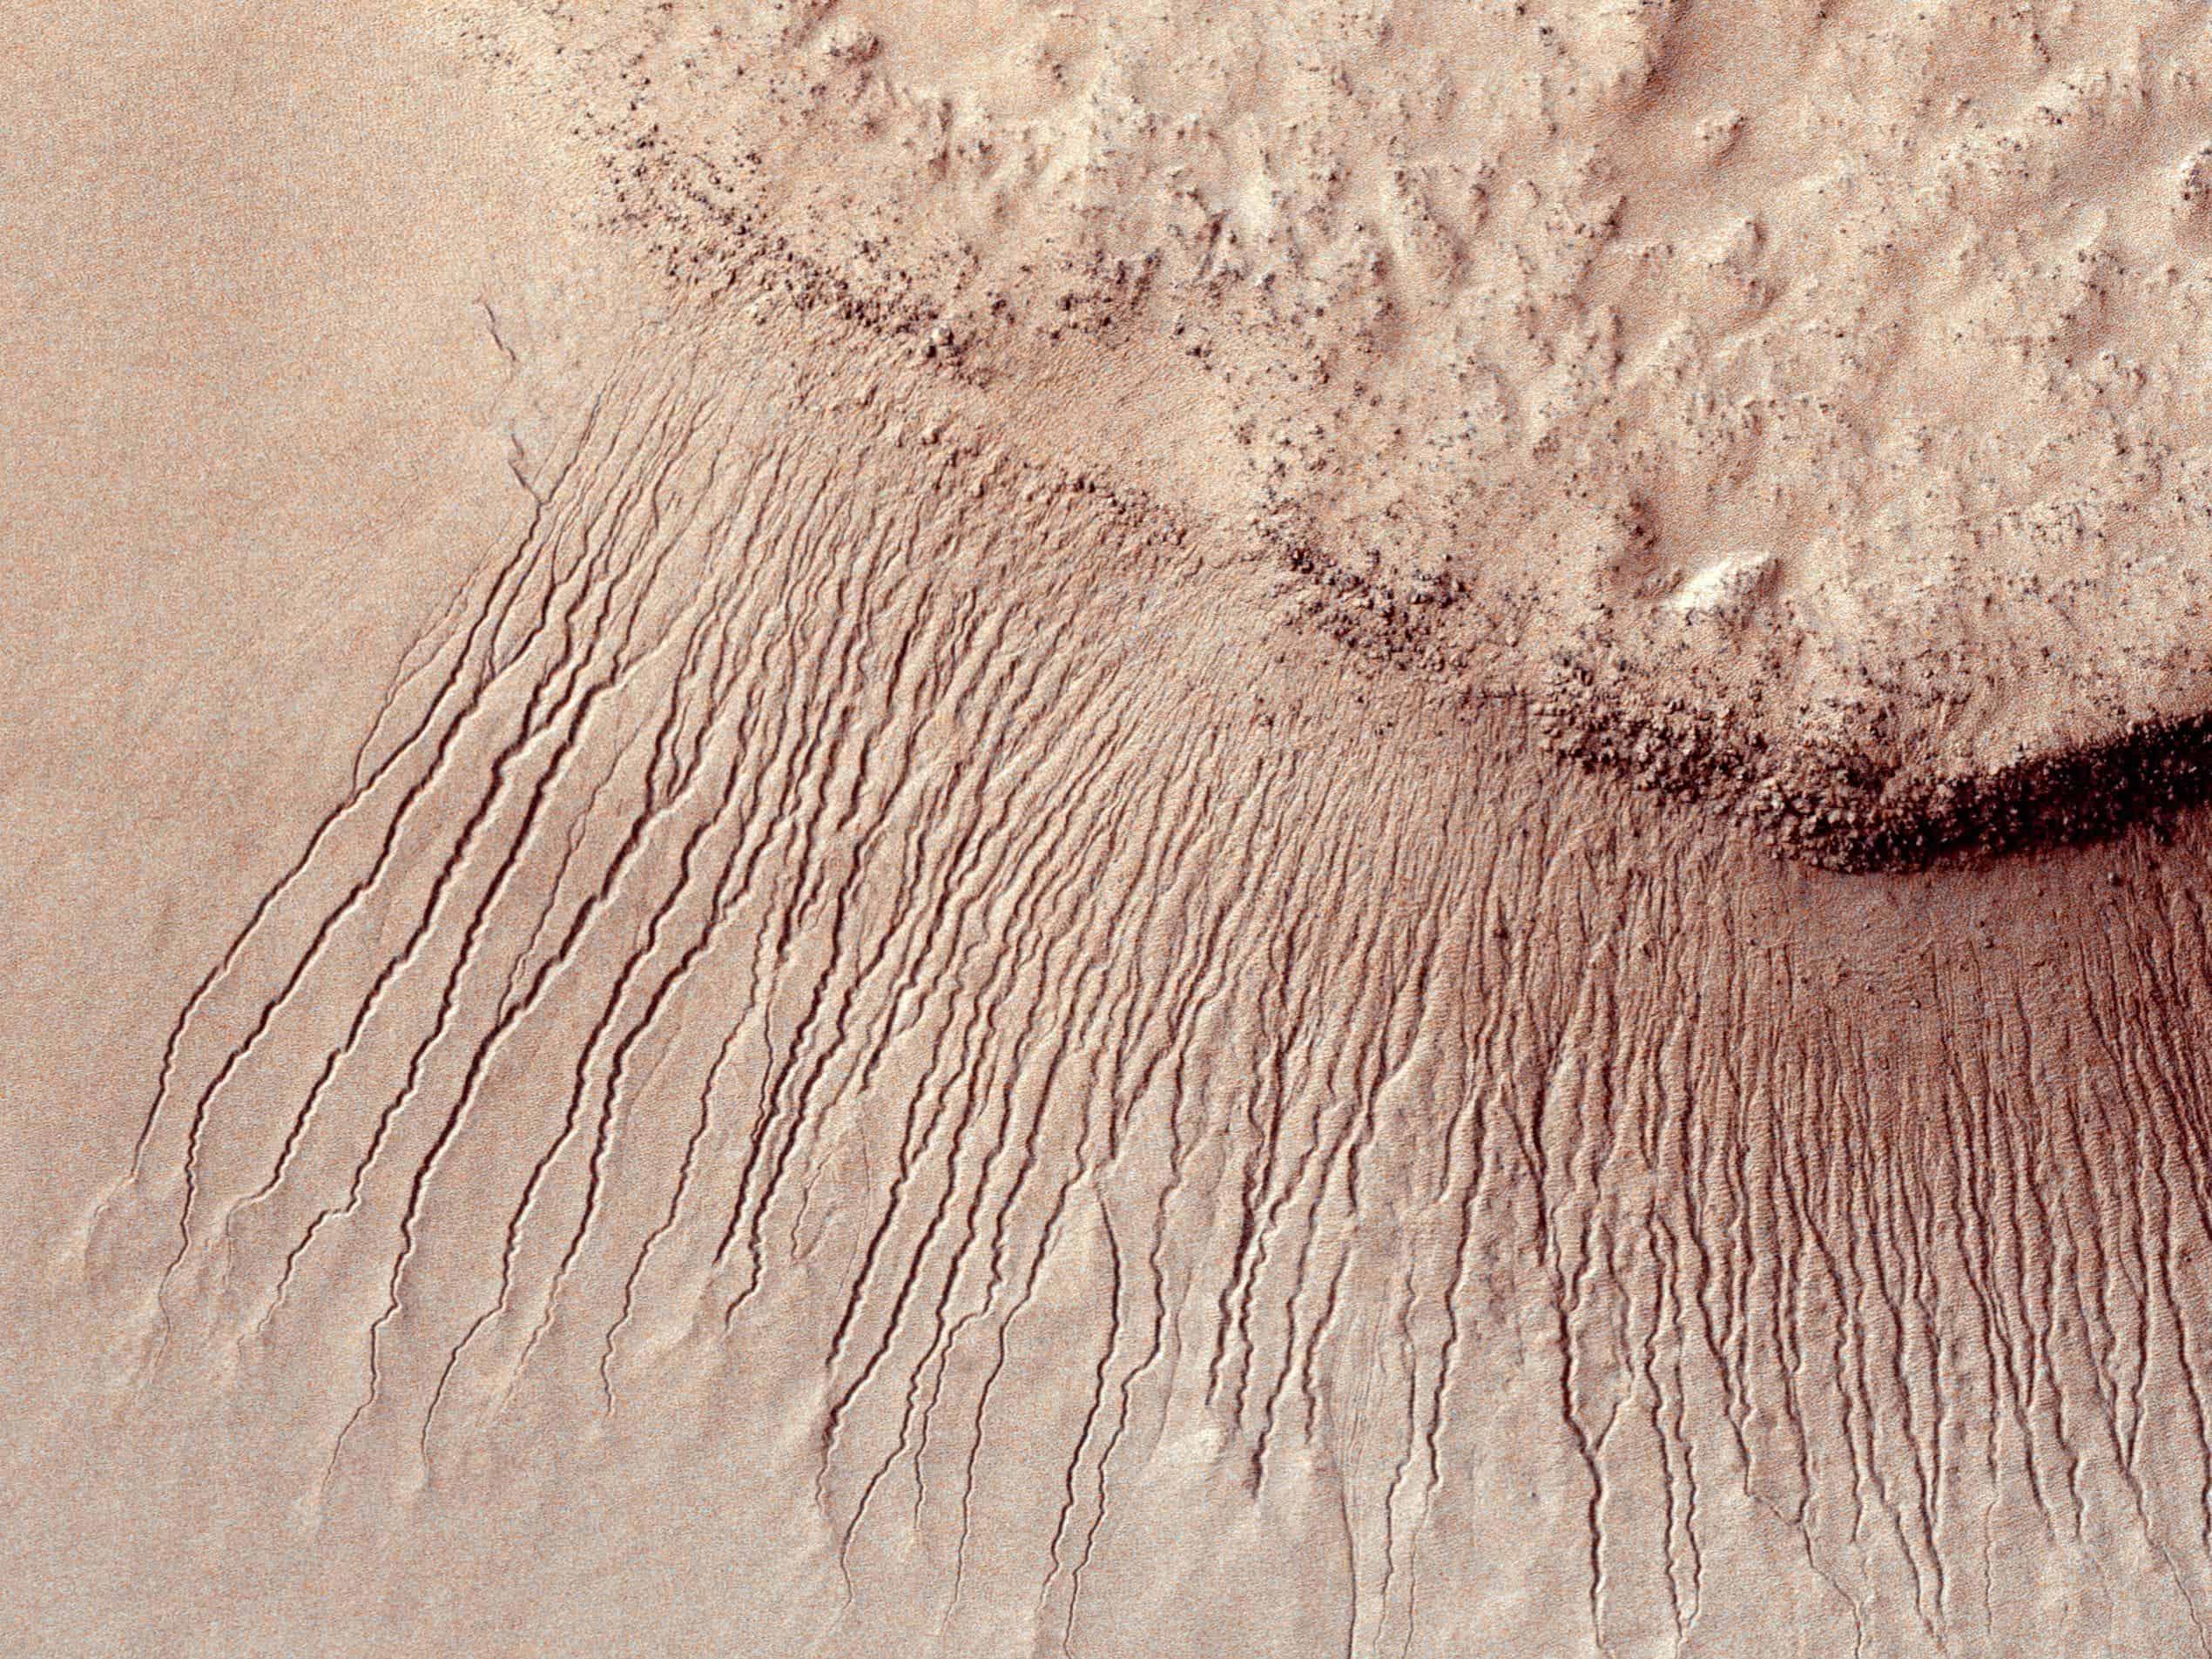 Boiling water shapes Mars' landscape, experiment reveals